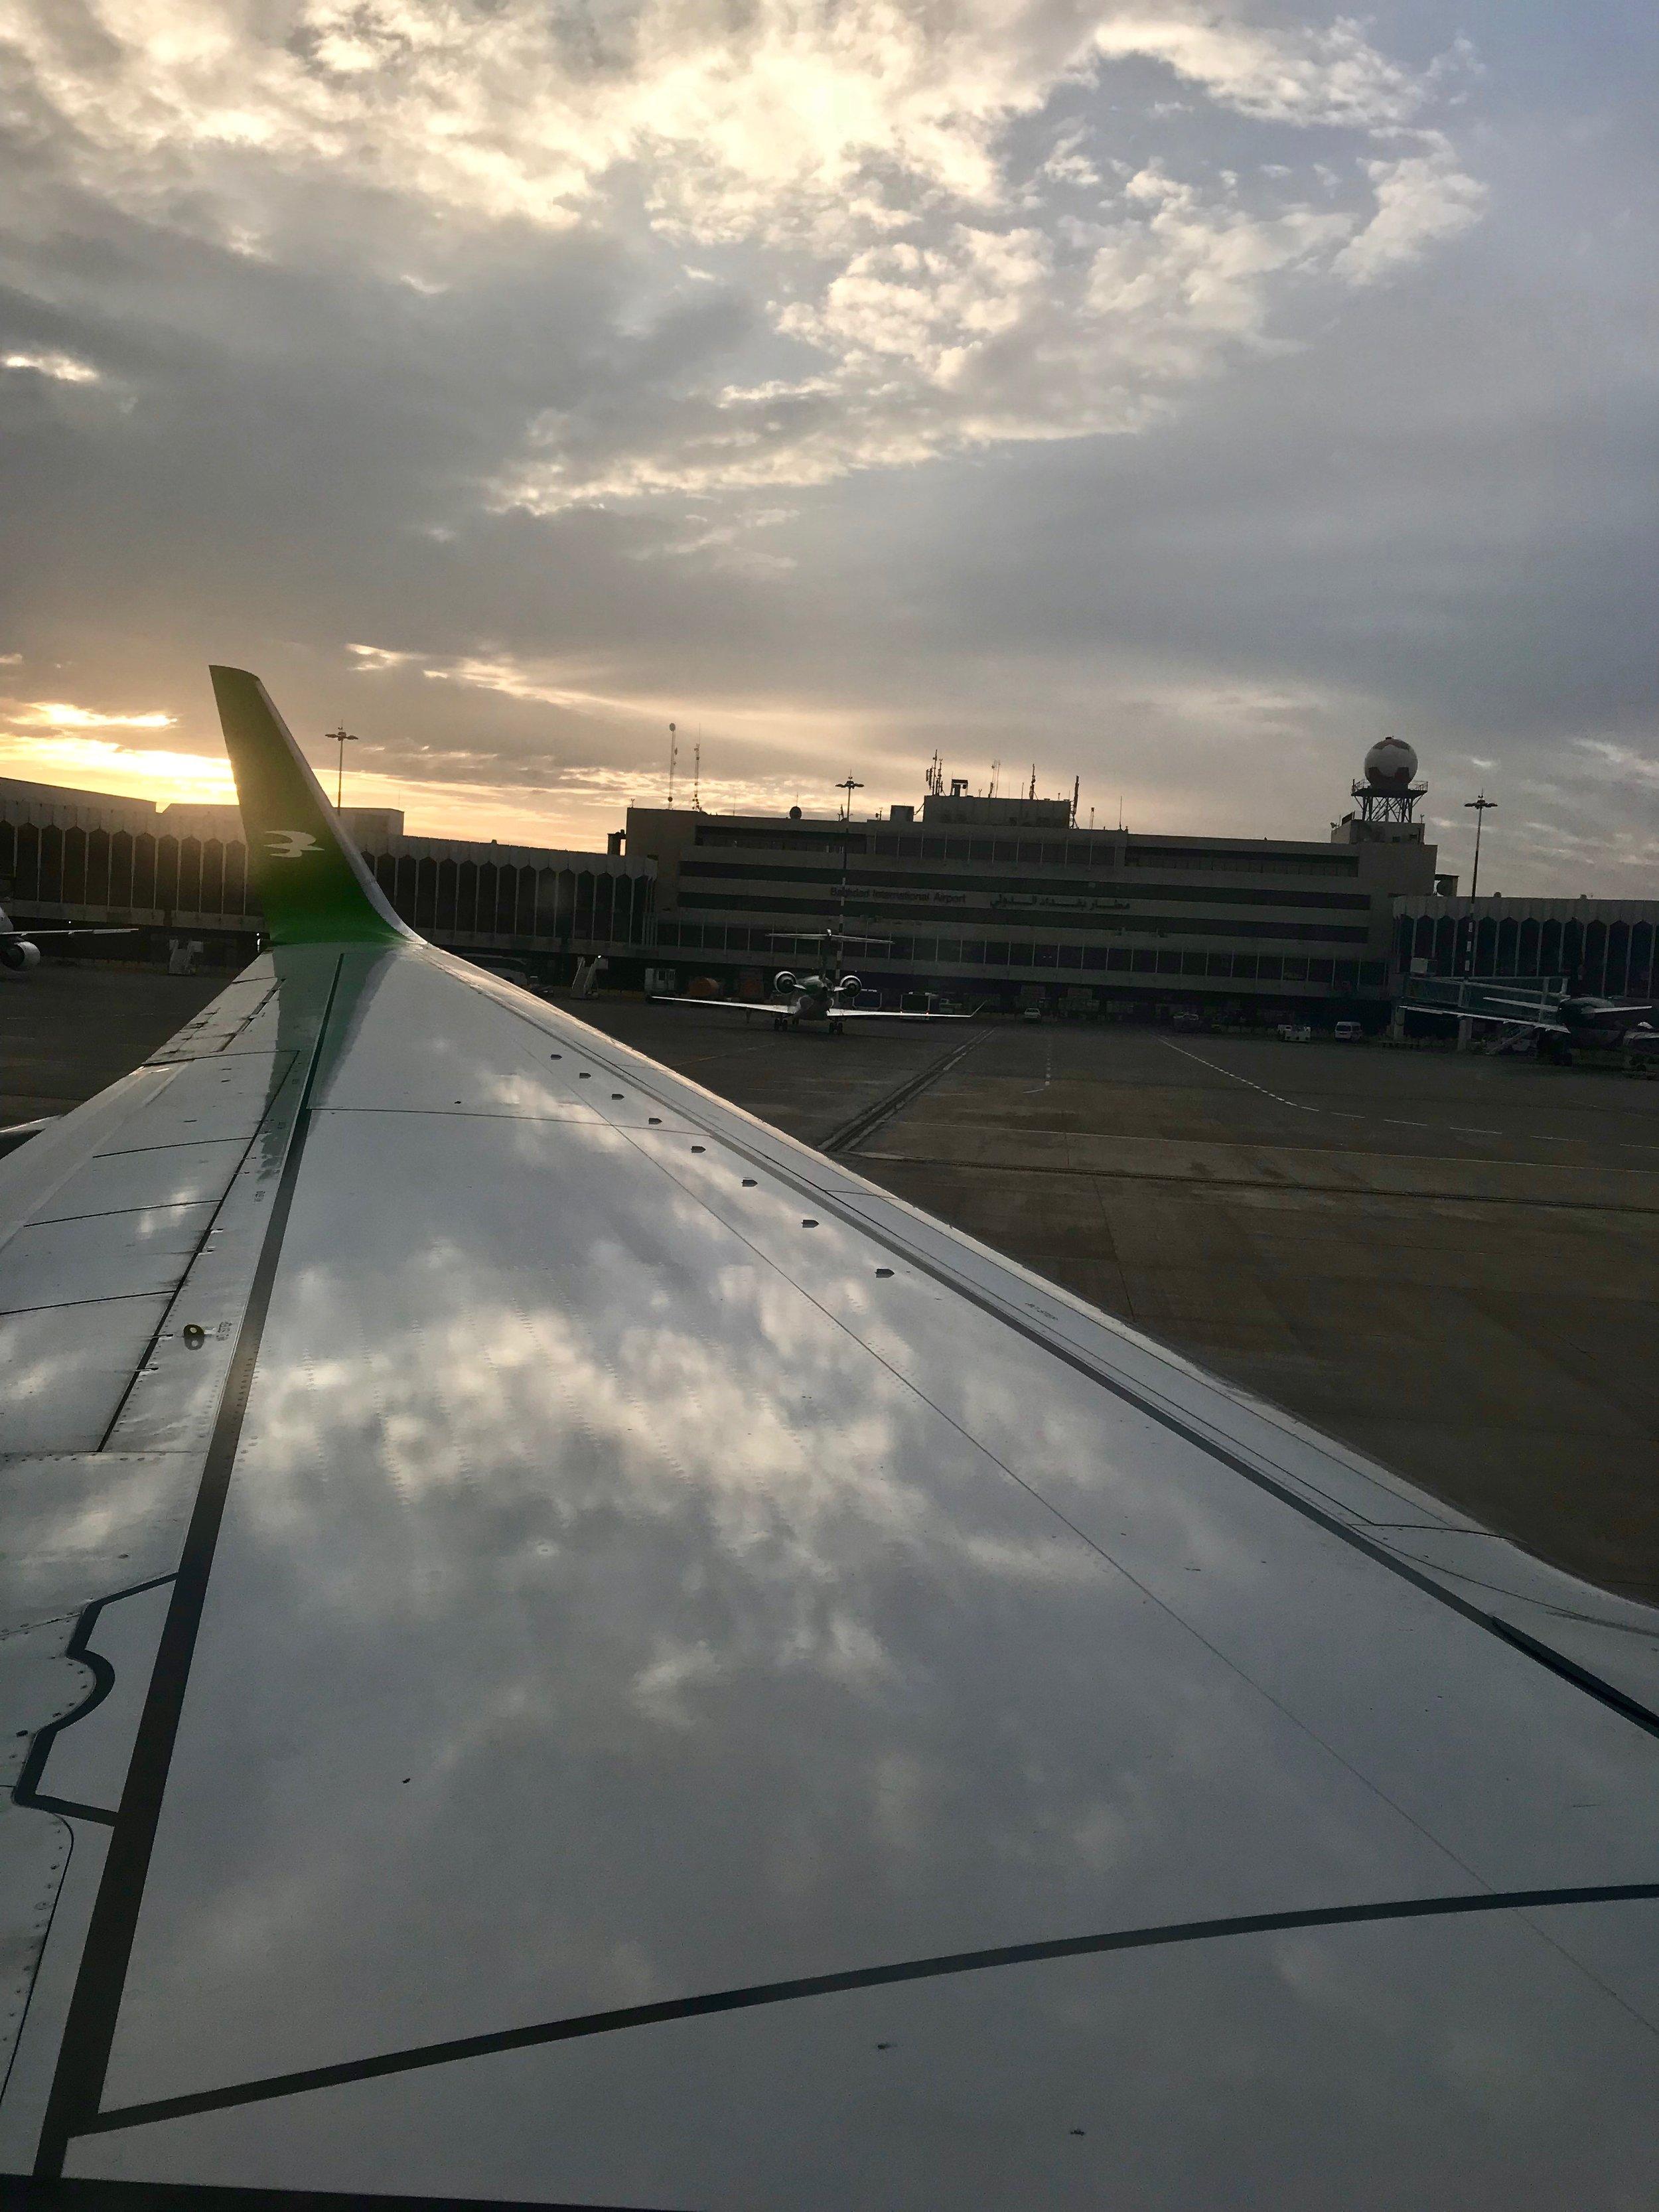 Arrival in Baghdad Iraq